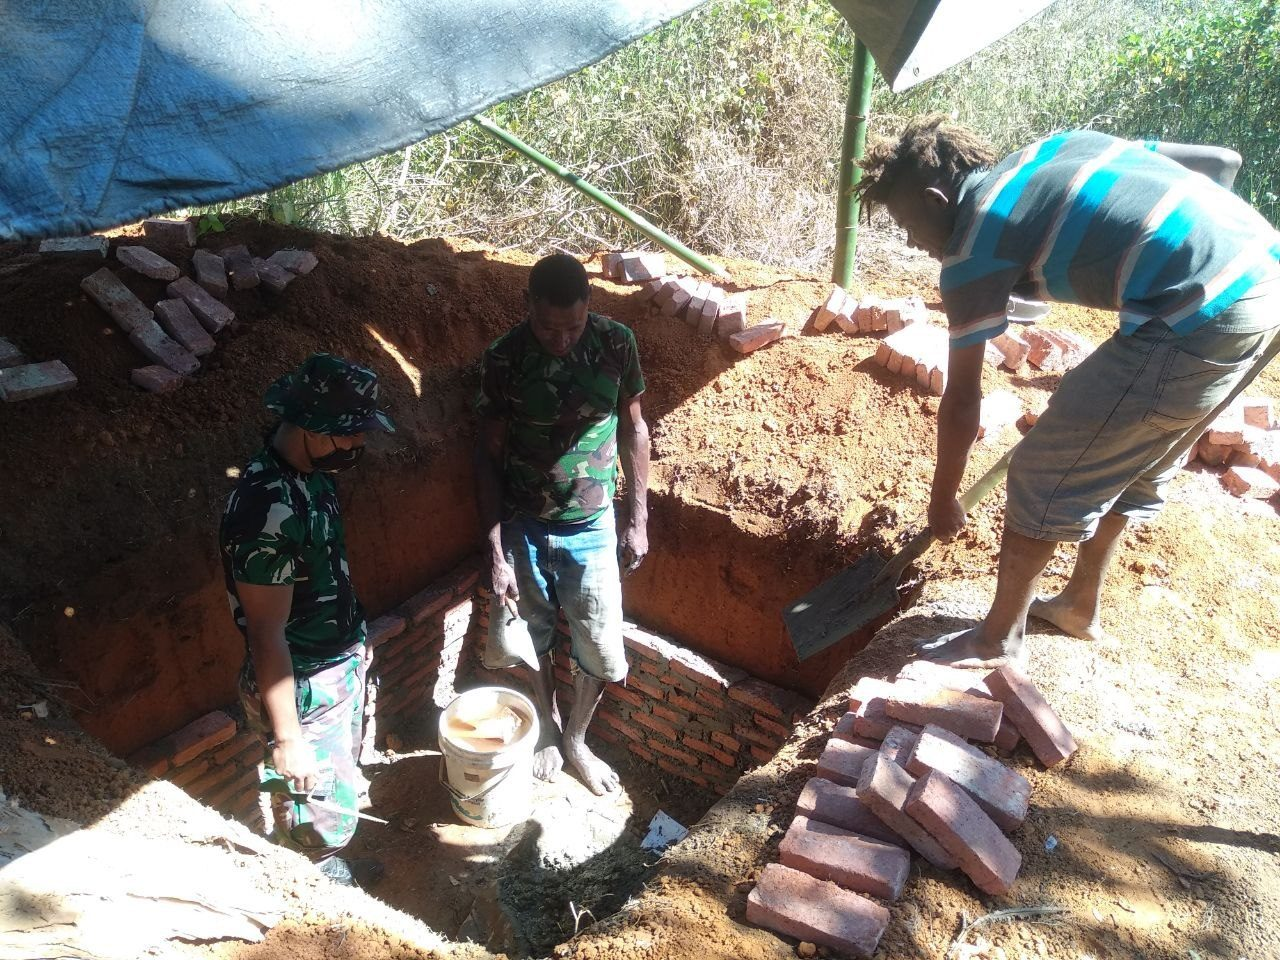 Satgas Yonif 125/Si'mbisa Bangun MCK, Warga Yanggandur Merauke Tak perlu Lagi Mandi di Sungai